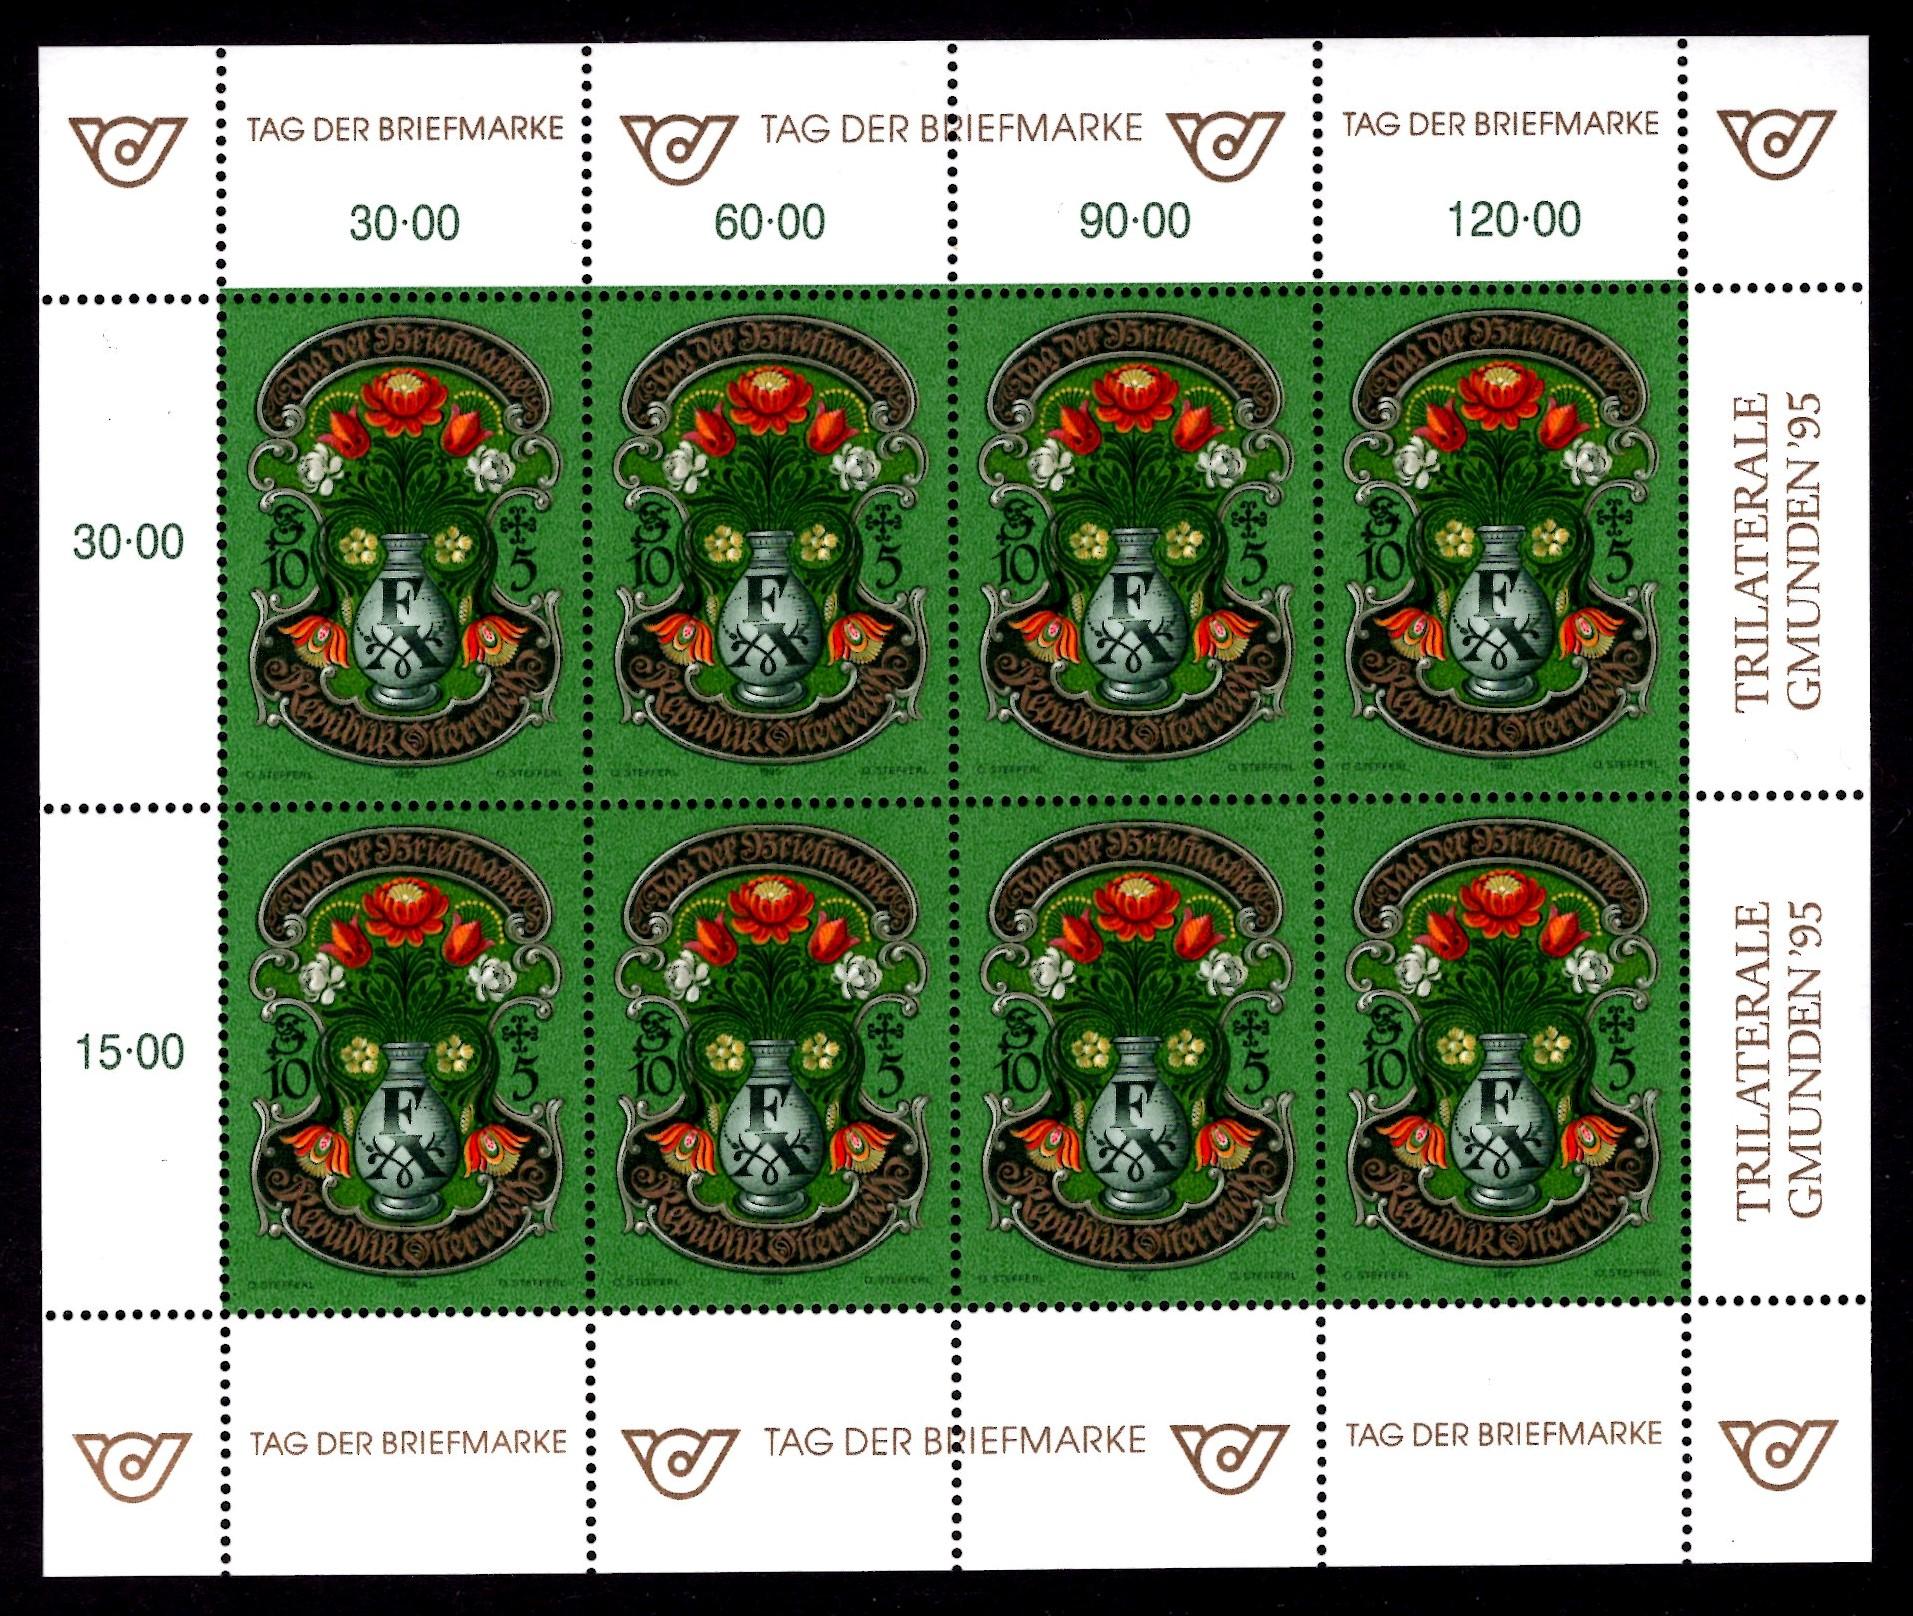 Österr KLBG Tag der Briefmarke 1995 Michel-Nr 2158